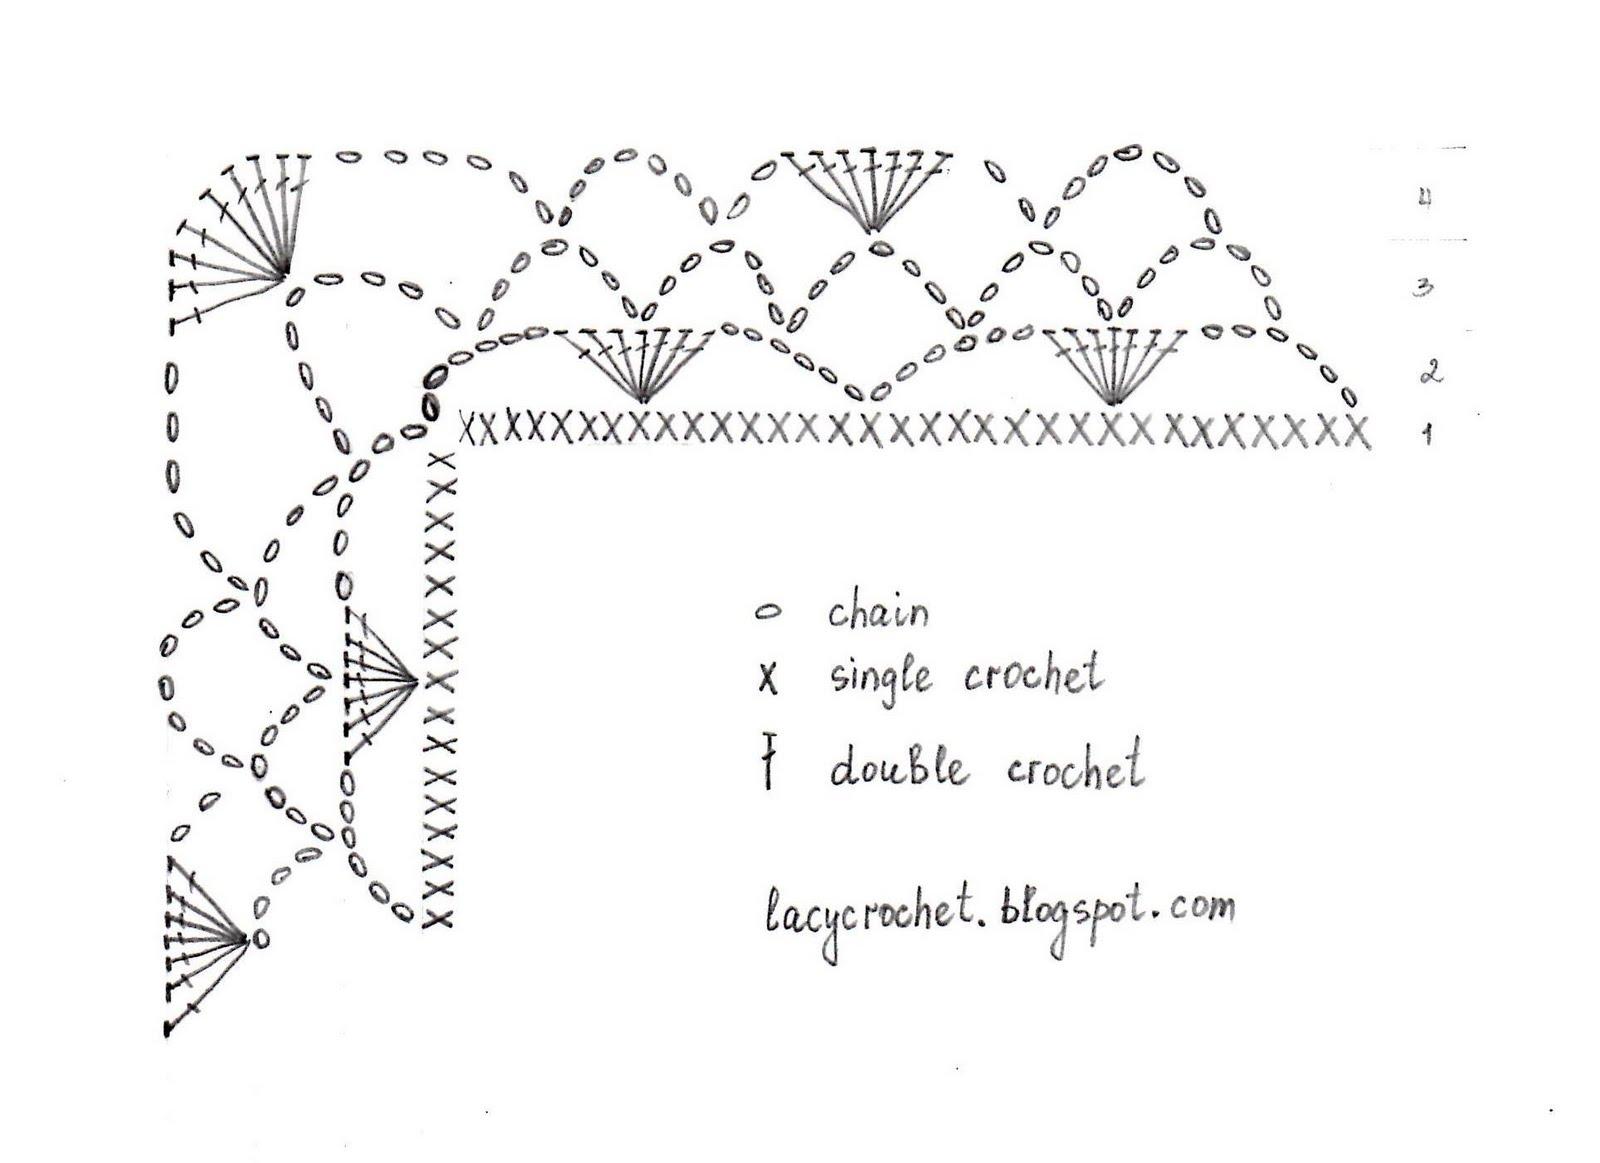 Lacy crochet more crochet edgings for handkerchiefs crochet lace pattern bankloansurffo Image collections